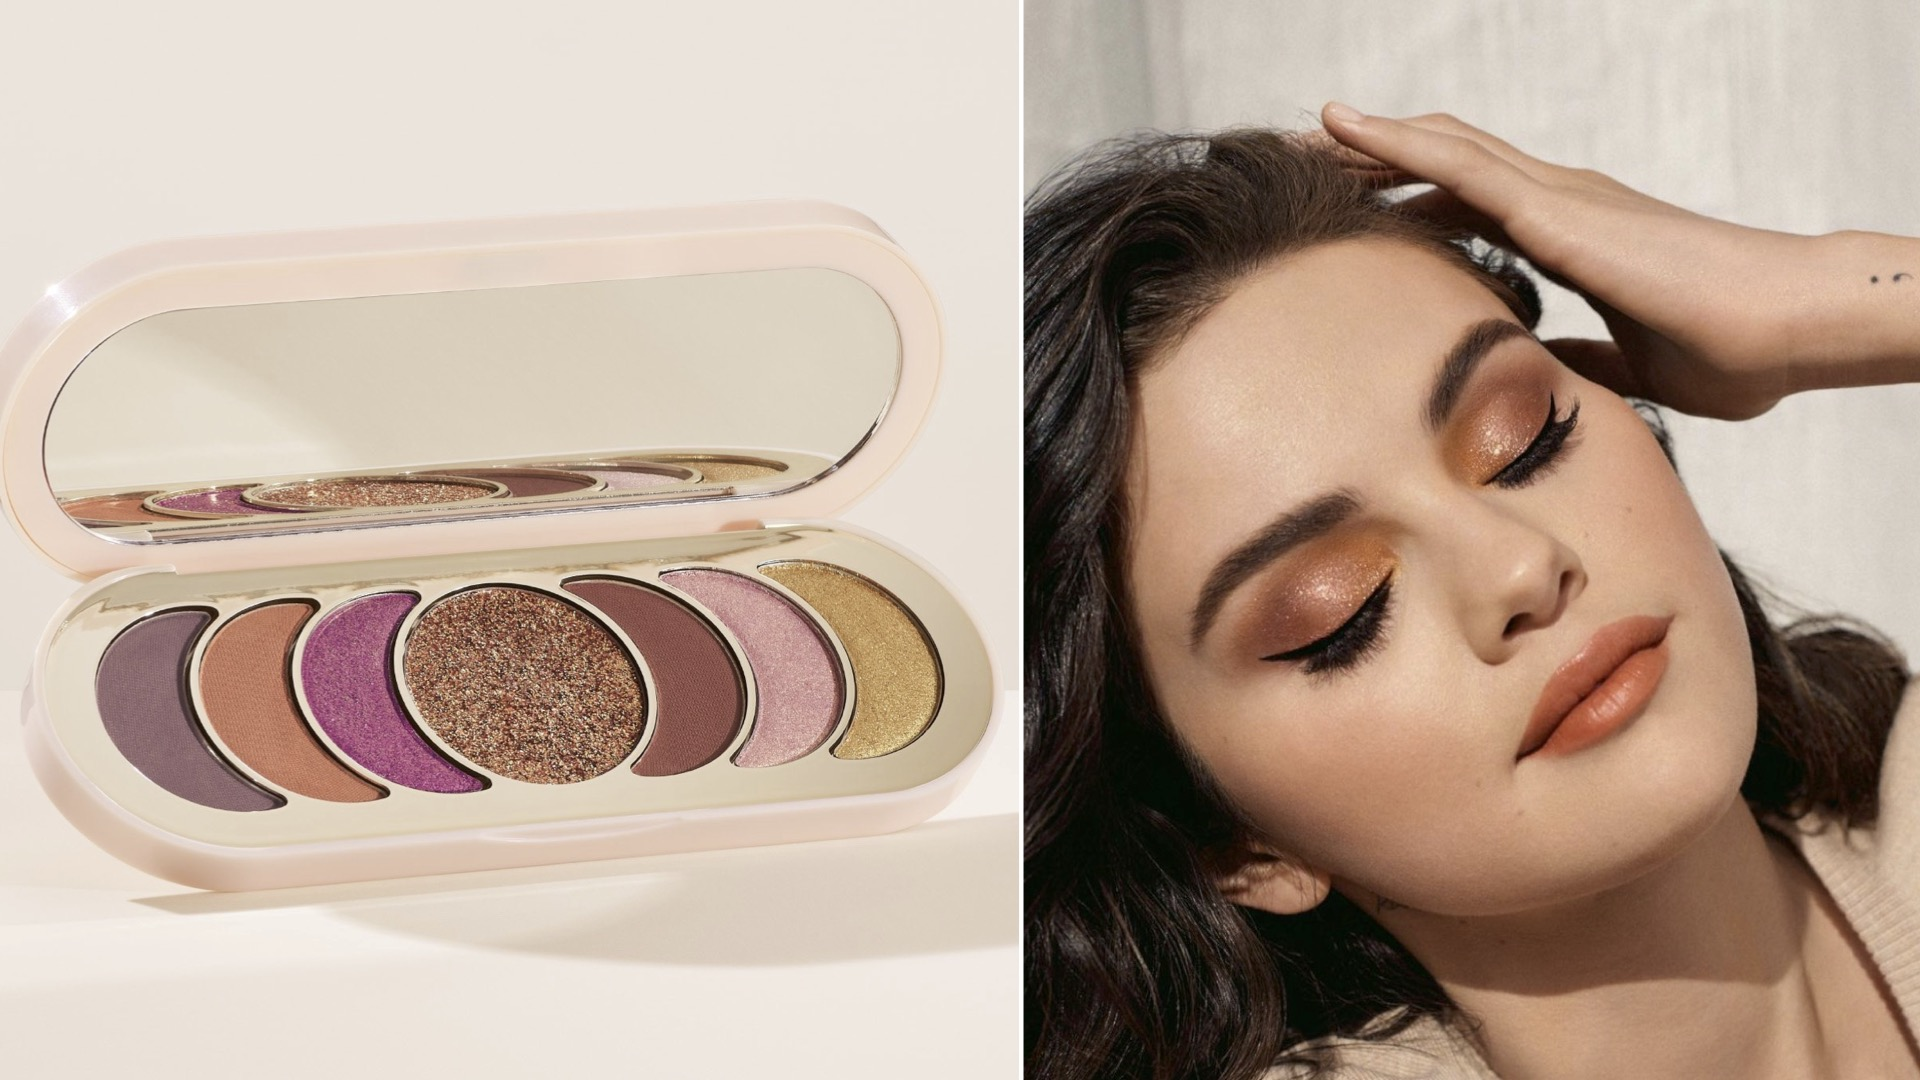 Selena Gomez, Rare Beauty, paleta de sombras, maquillaje